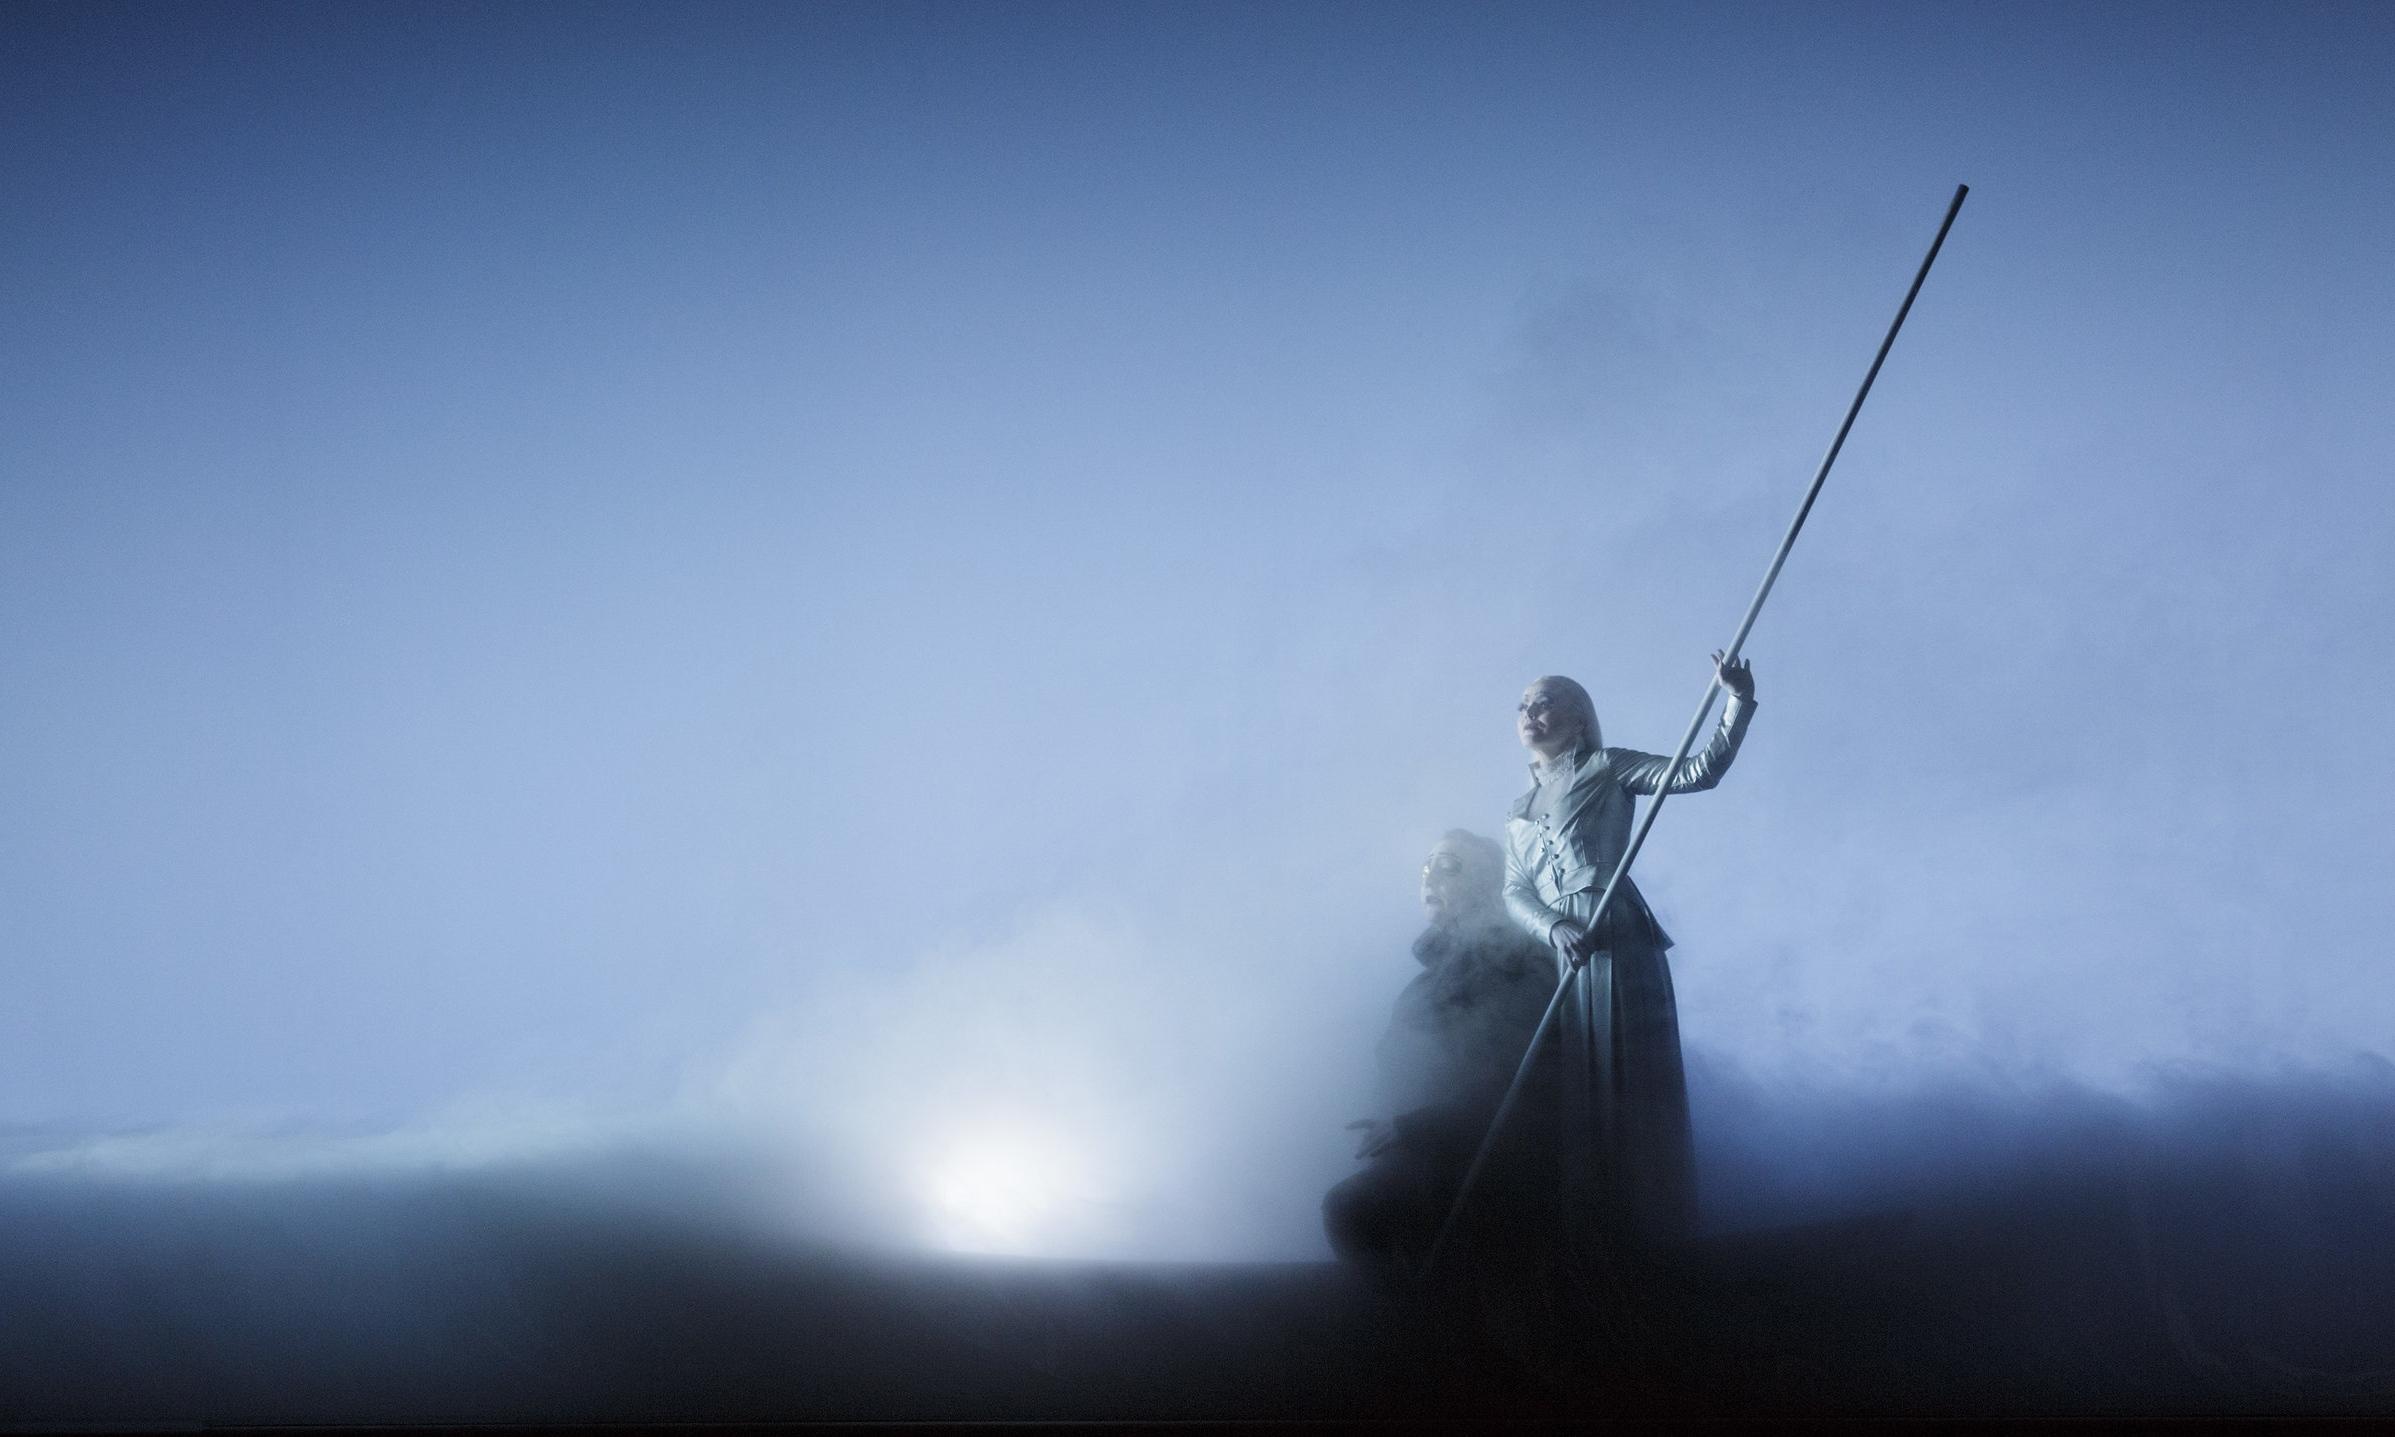 Kneeplay 5 - Epilogue: Henrik Rafaelsen (Odin), Gjertrud Jynge (Volva)